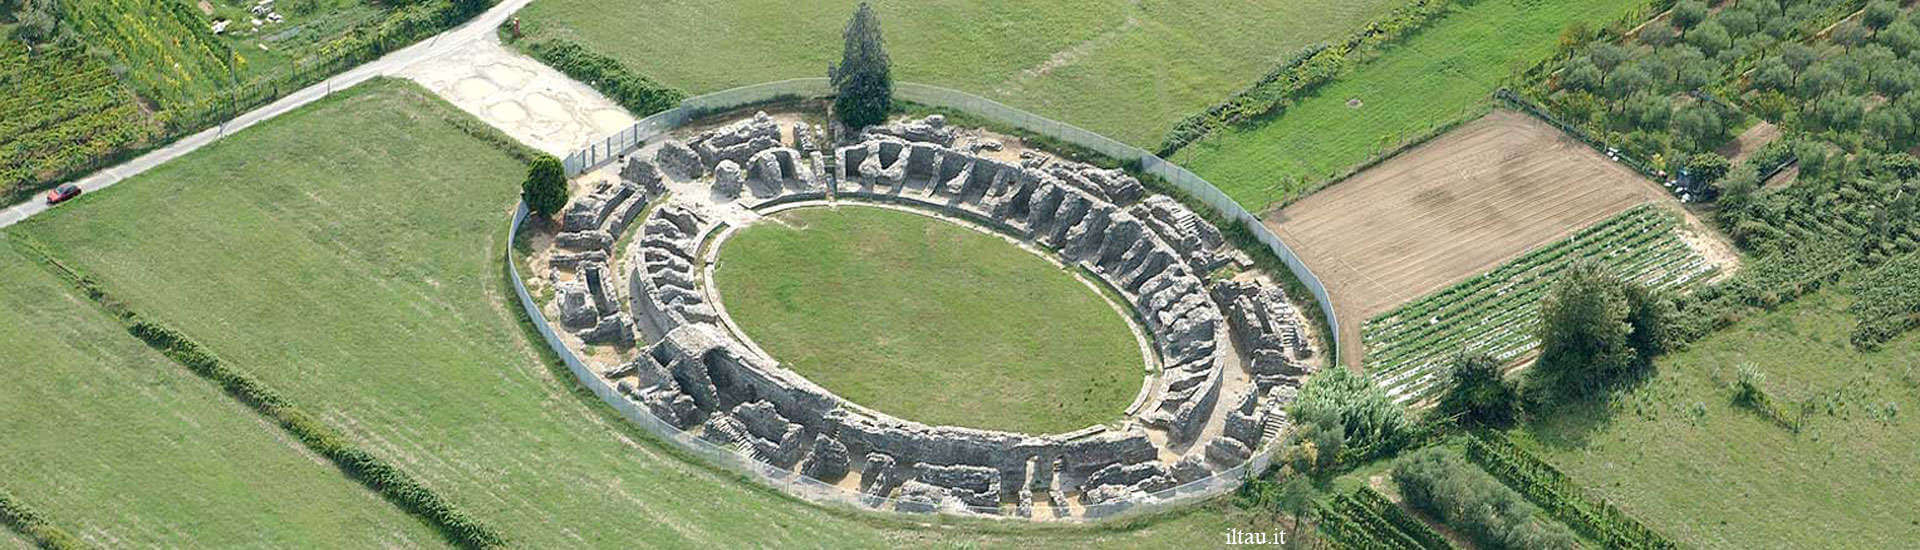 Roman Amphitheater of Luni, Liguria